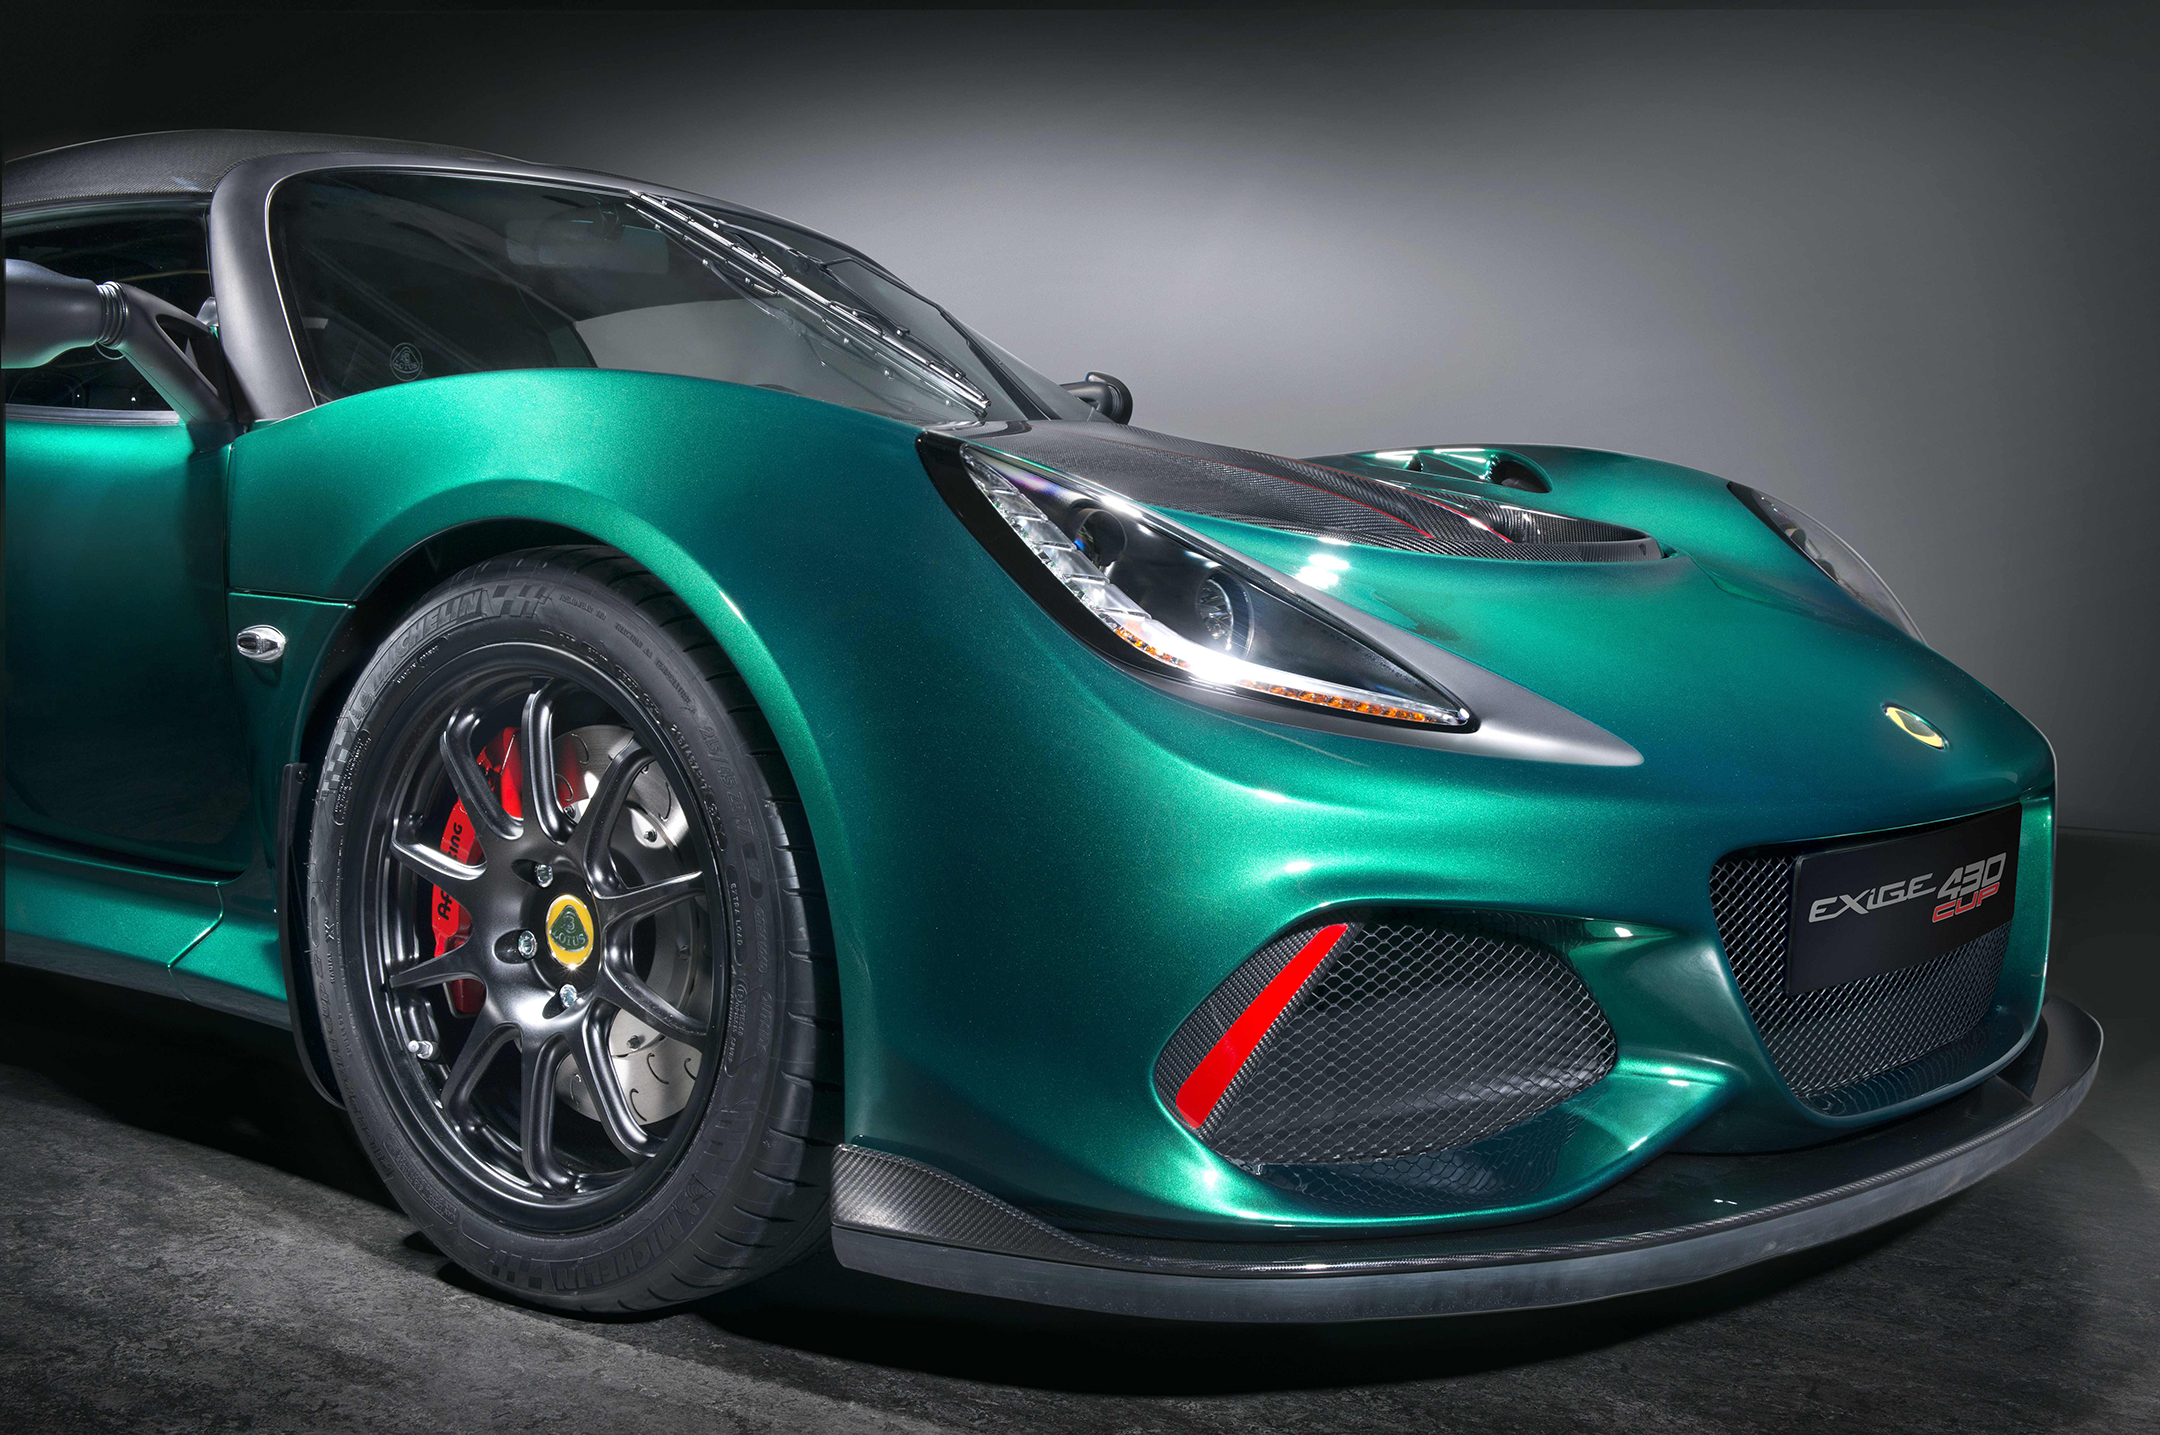 Lotus Exige Cup 430 - 2017 - front wheel